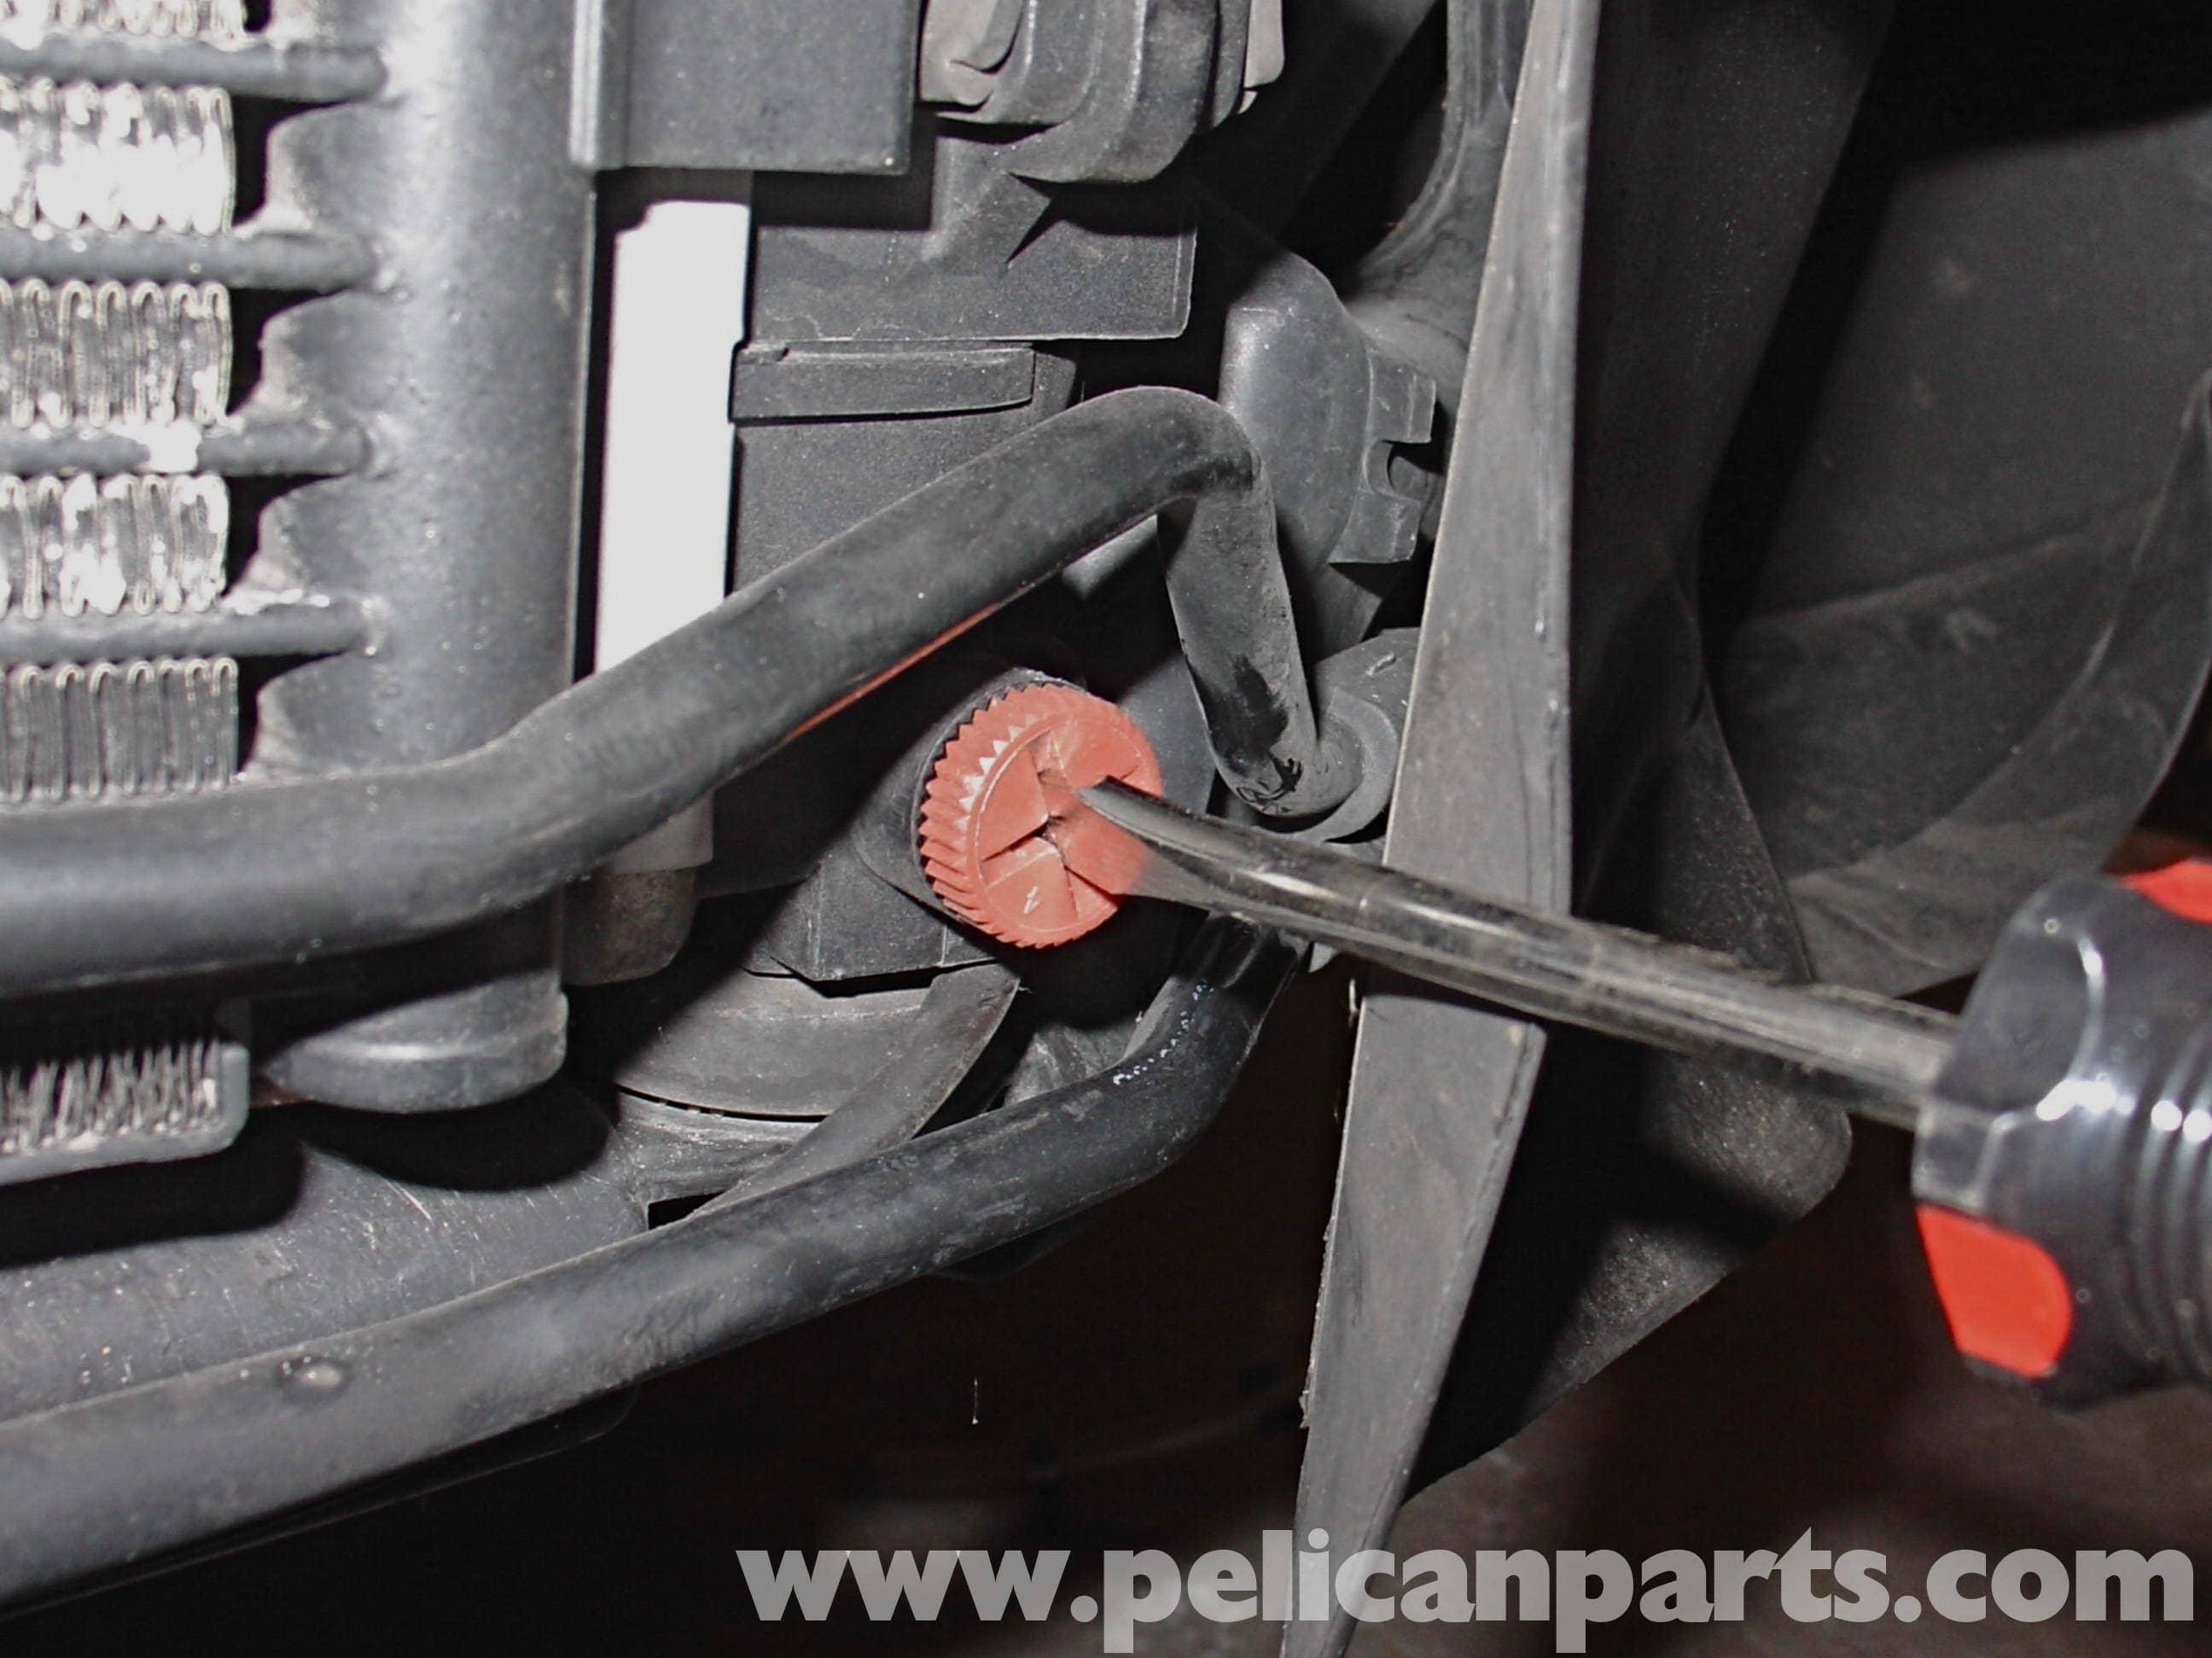 Radiator Drain Plug Tool Bob Is The Oil Guy